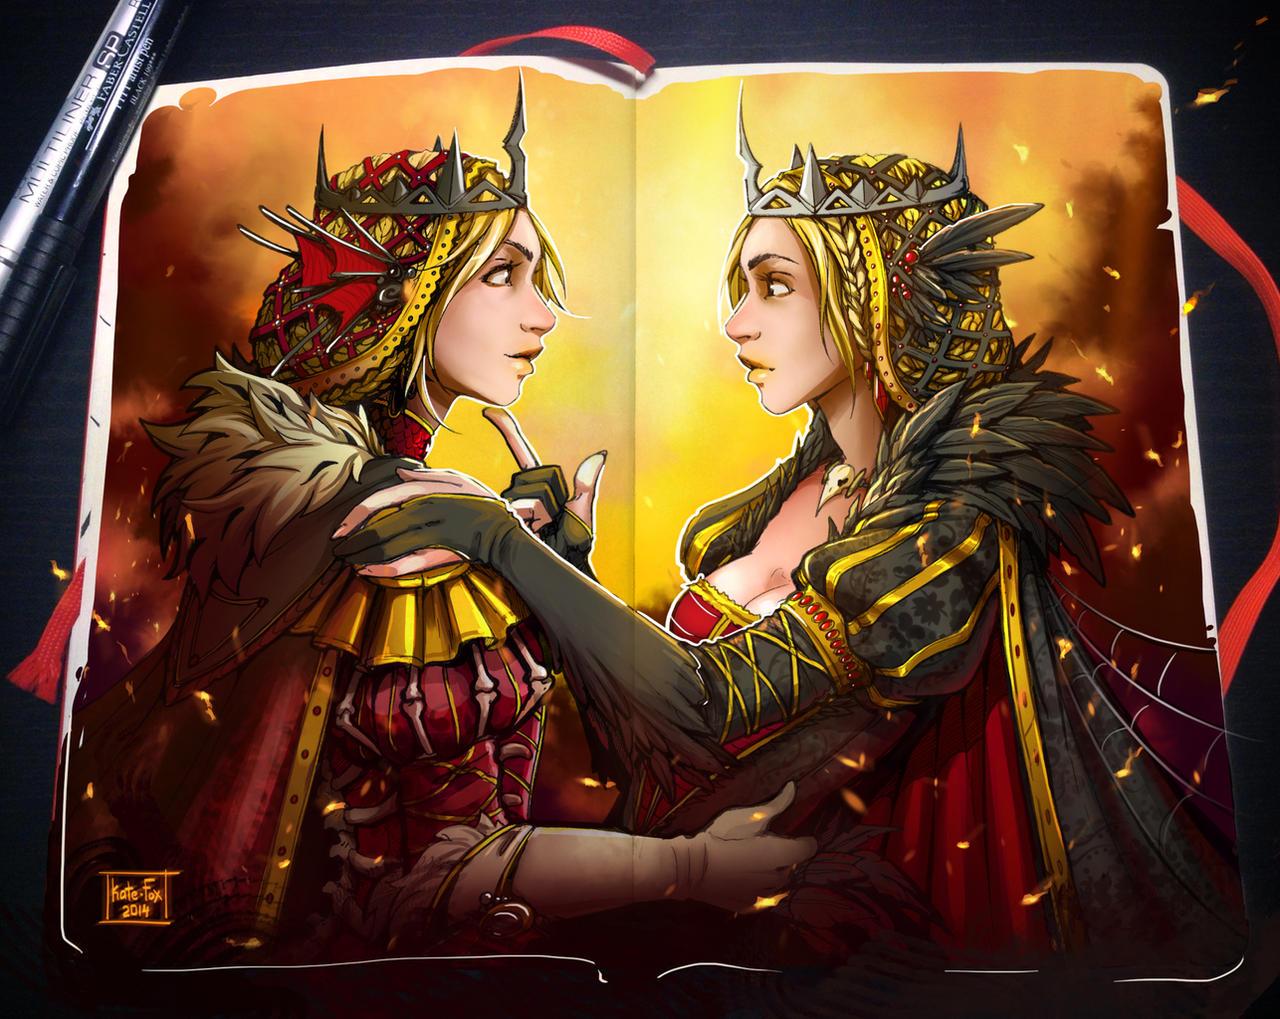 Moleskine: Evil Twins by Kate-FoX